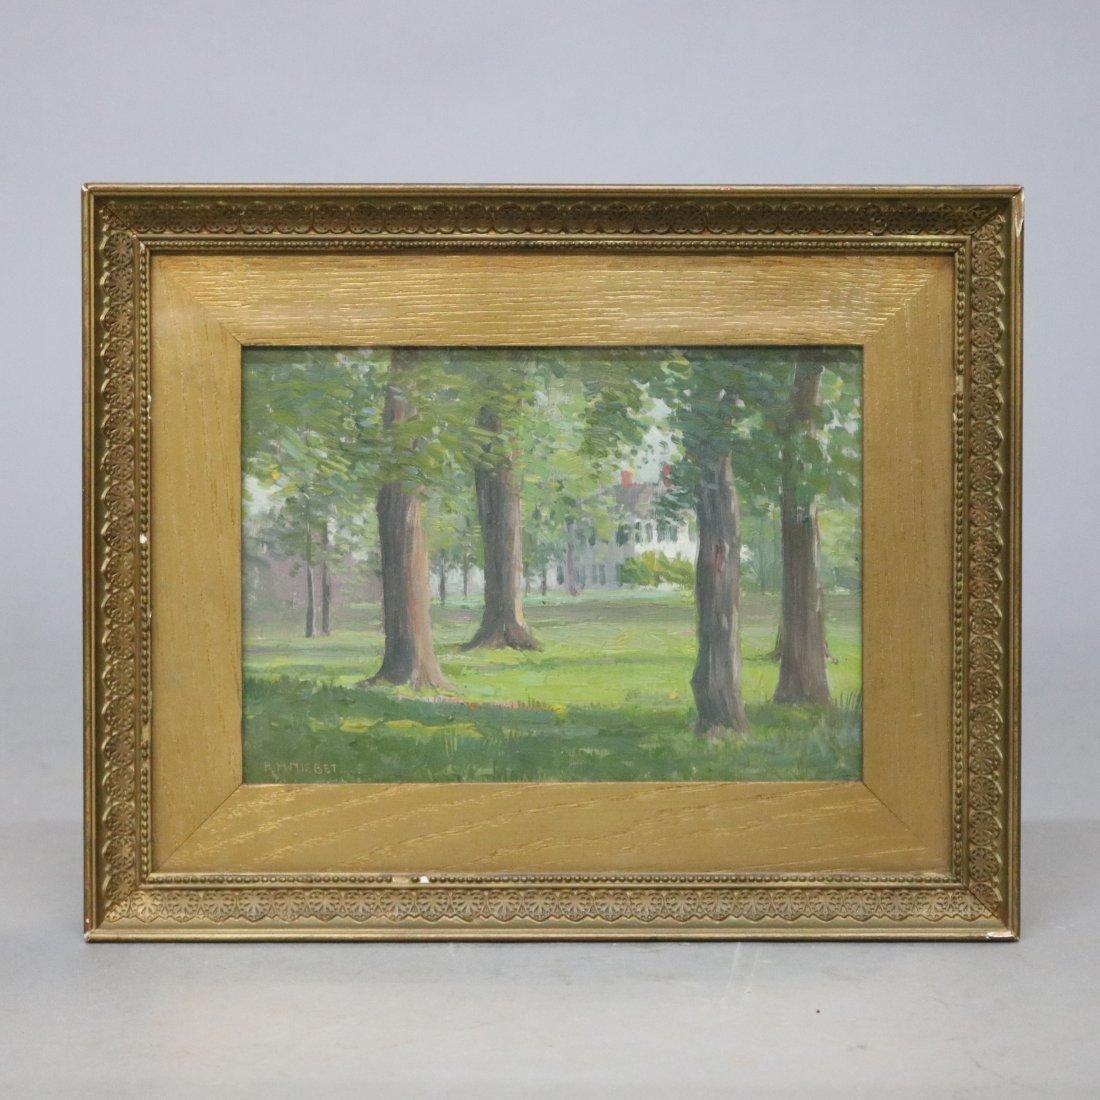 Antique Landscape Painting by Robert Hogg Nisbet